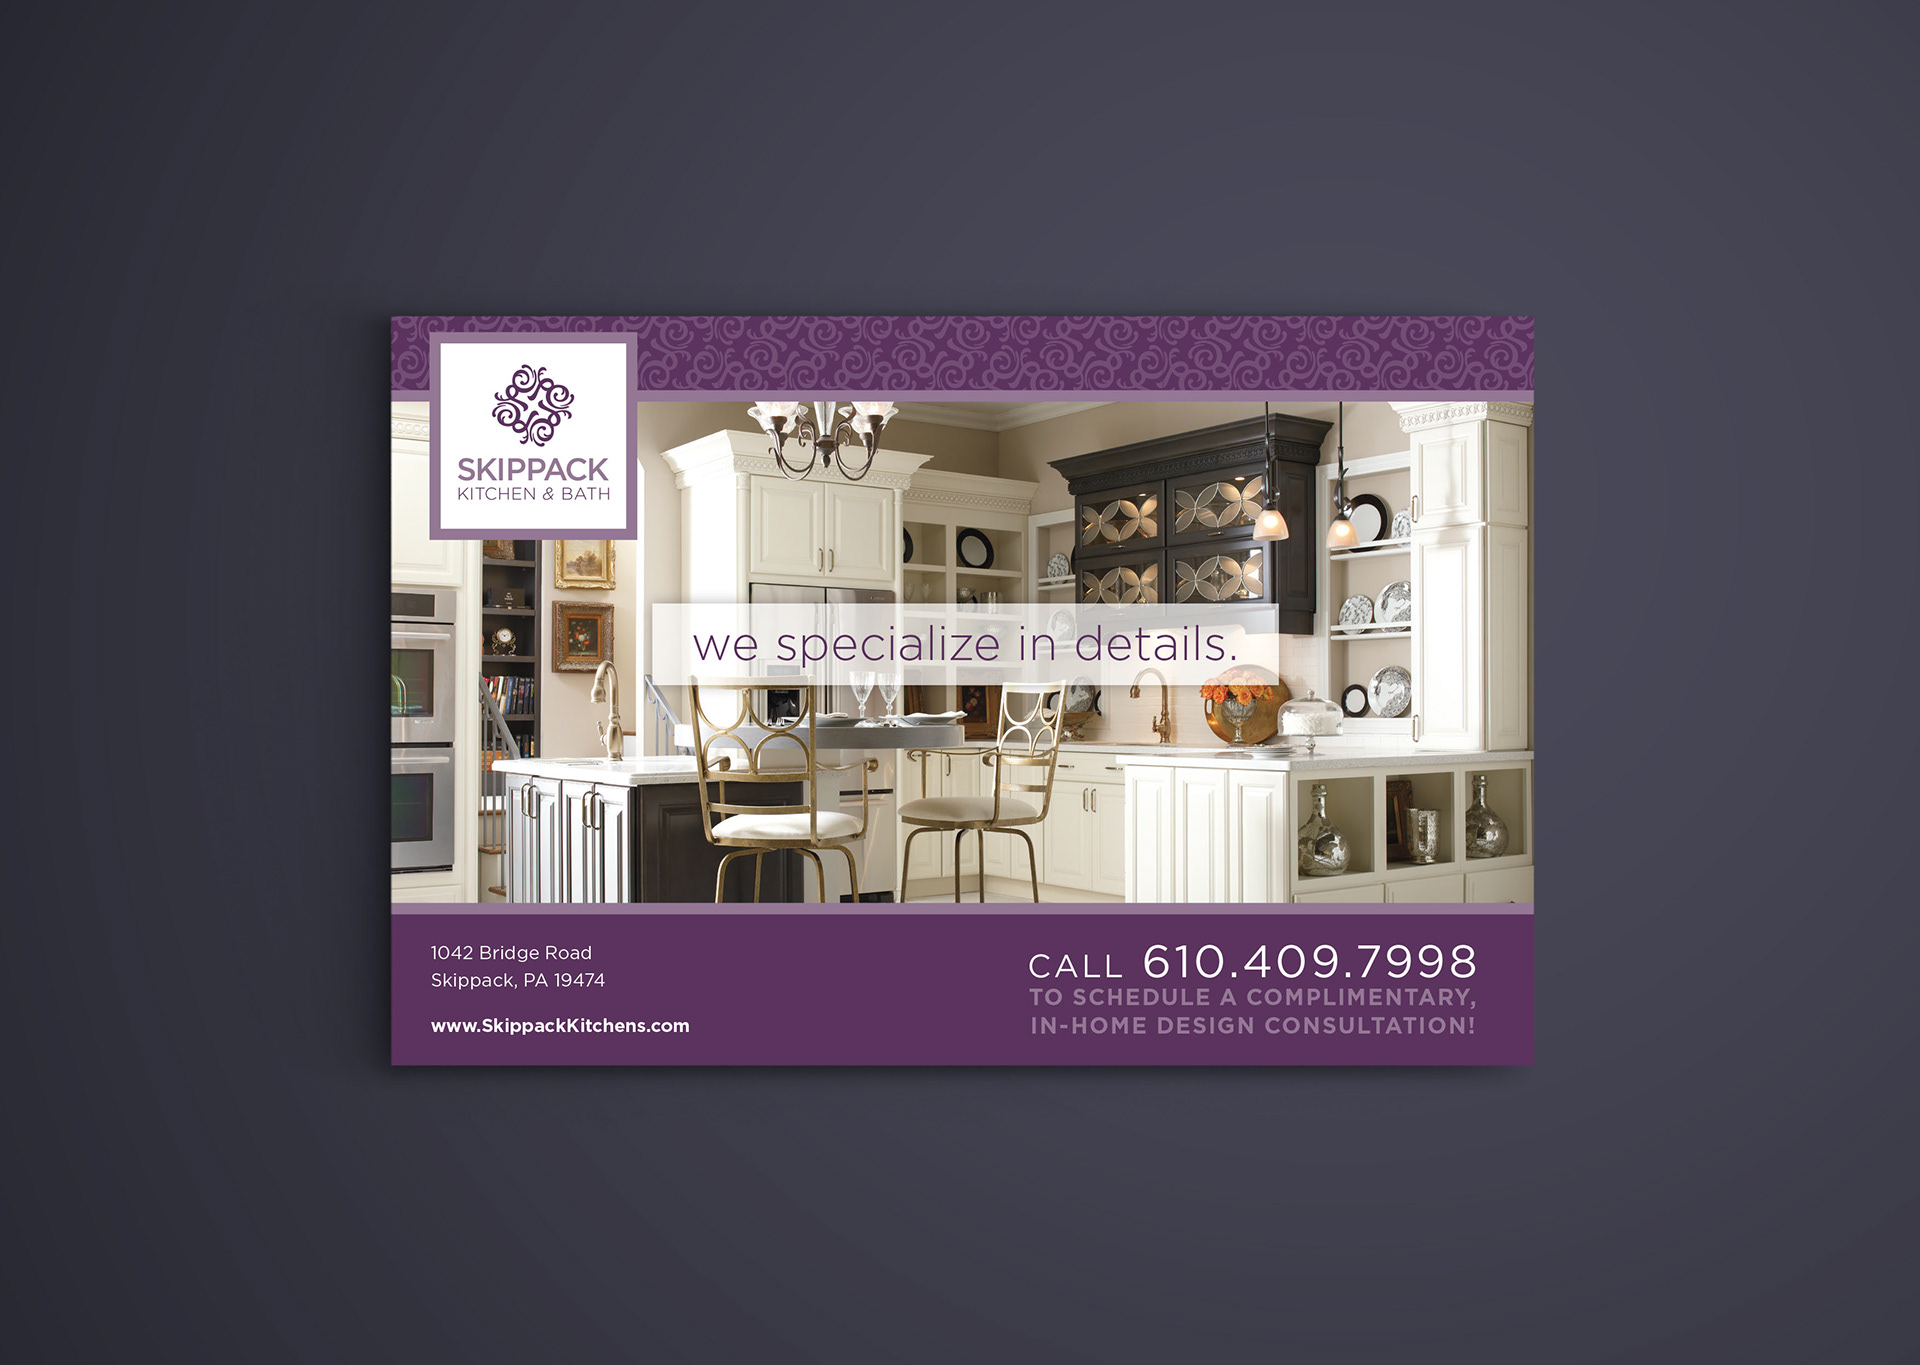 Skippack Kitchen And Bath